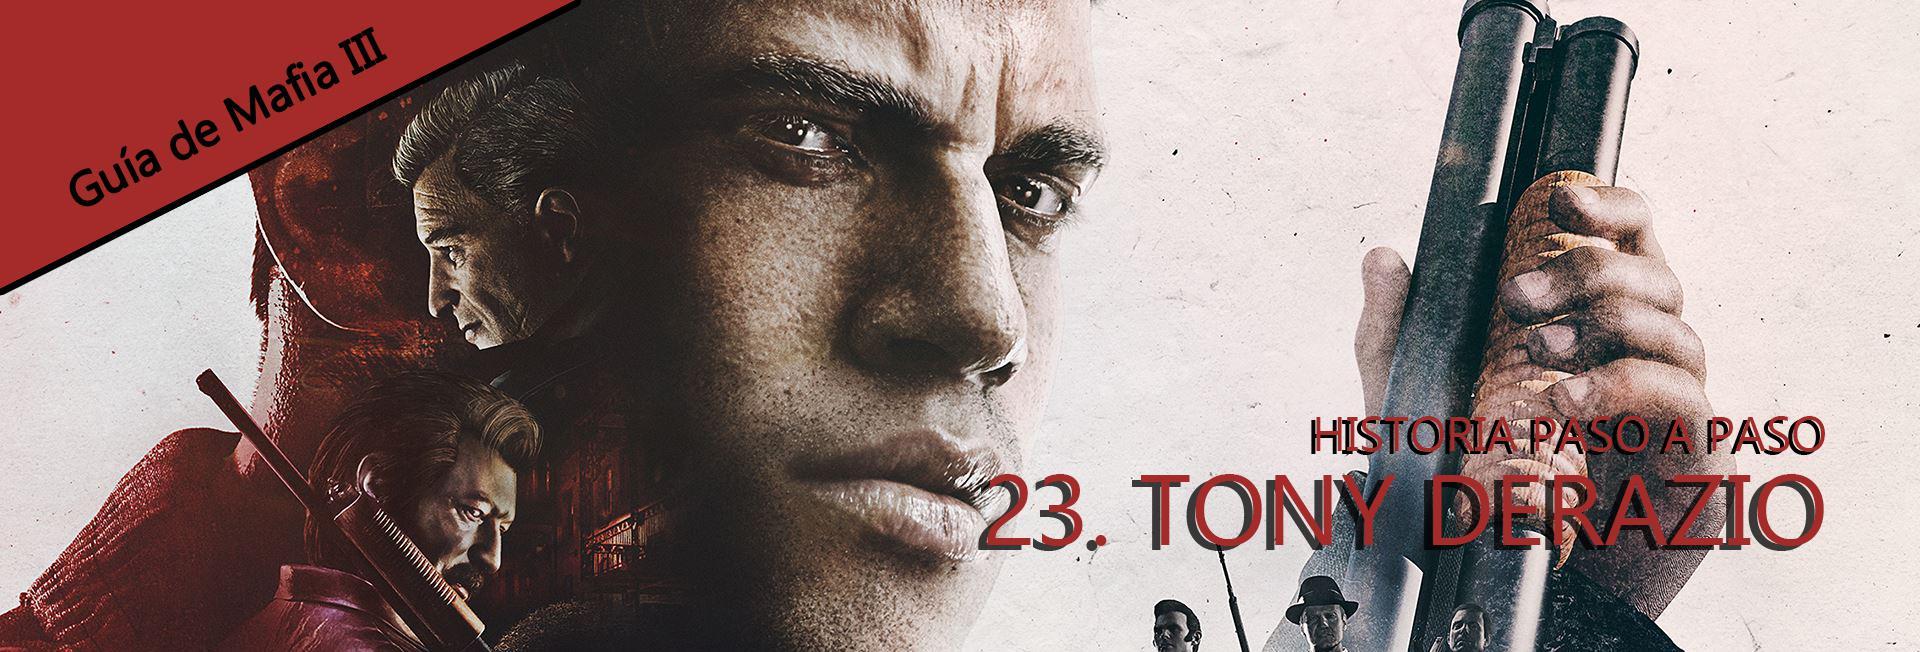 Guia De Mafia Iii Mision 28 Tommy Marcano Meristation